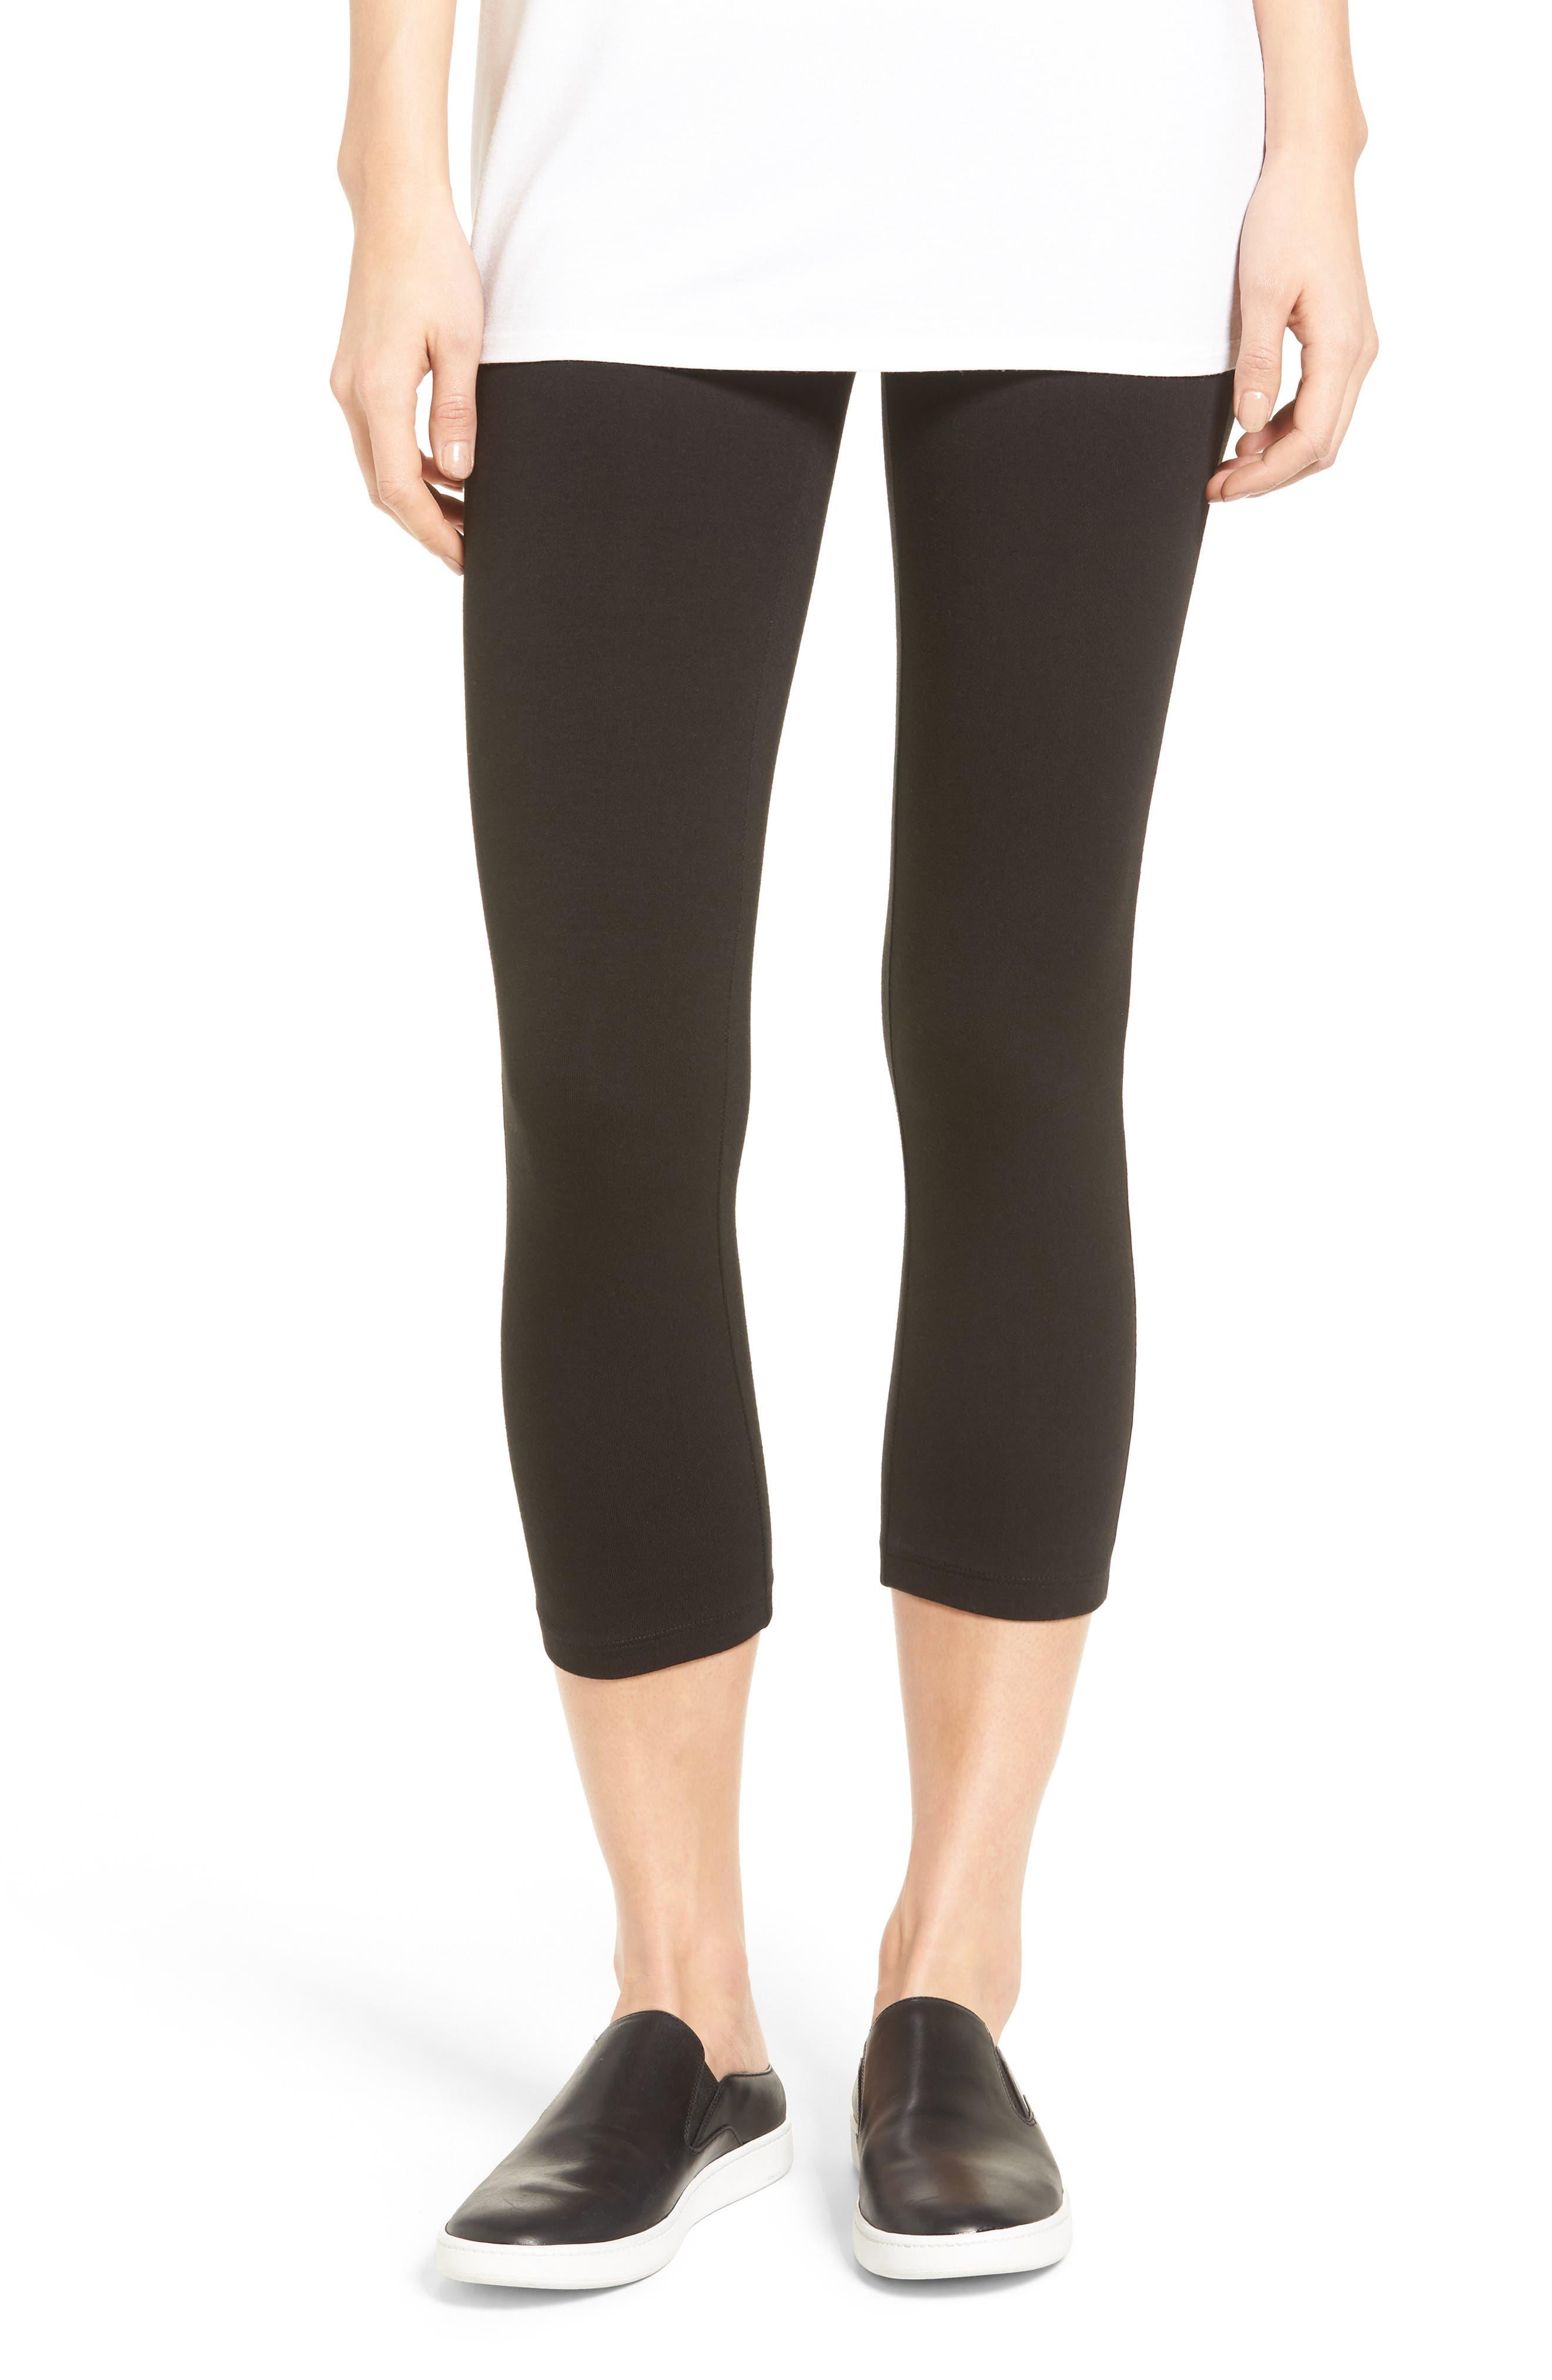 Hue Cropped Pants for Women: Jeans, Print, Capri & More | Nordstrom